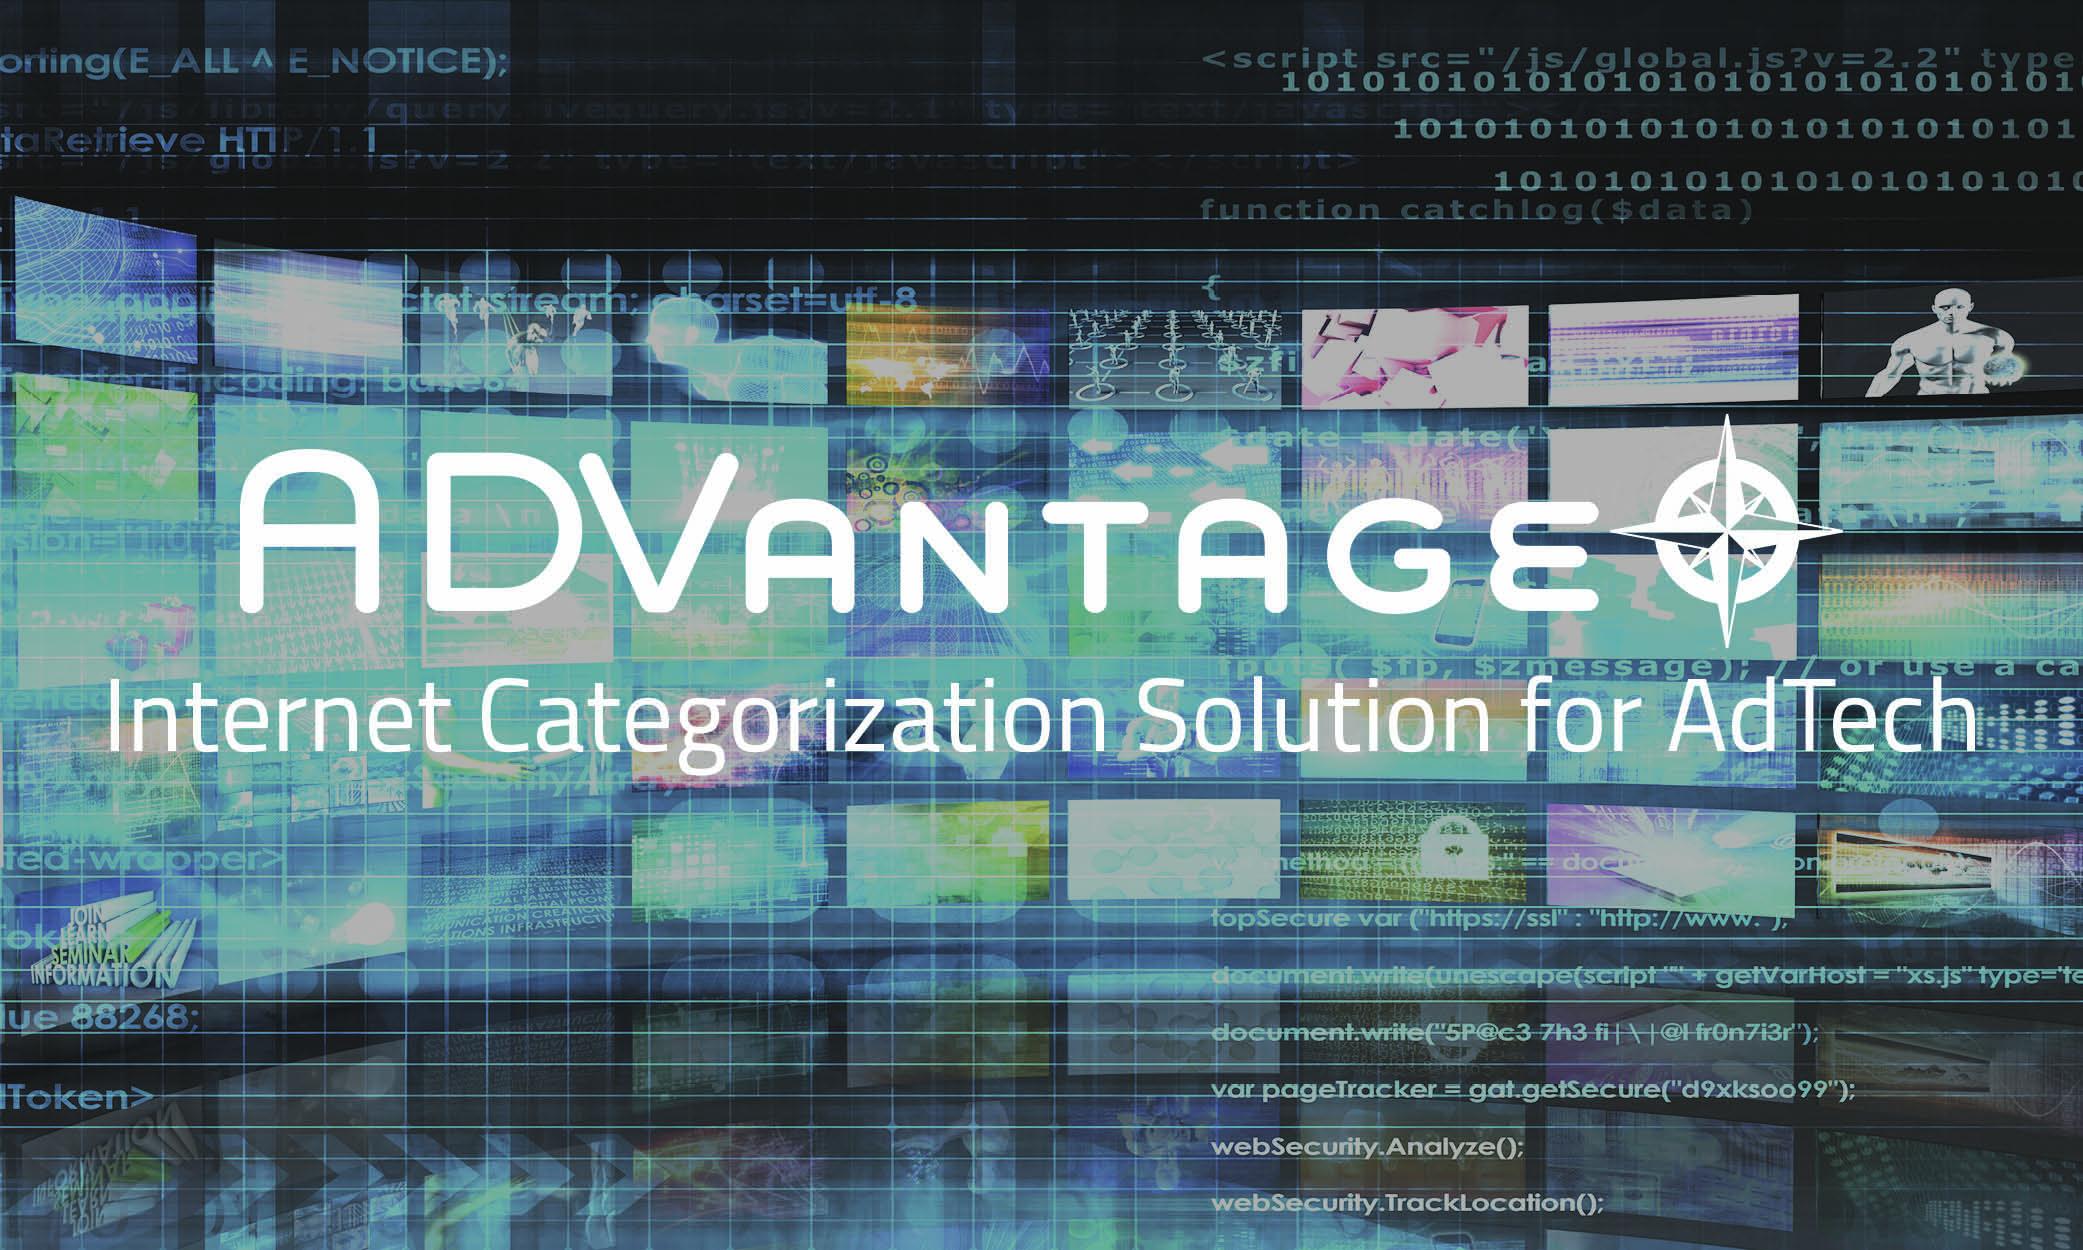 inCompass ADVantage OEM internet categorization for ad tech